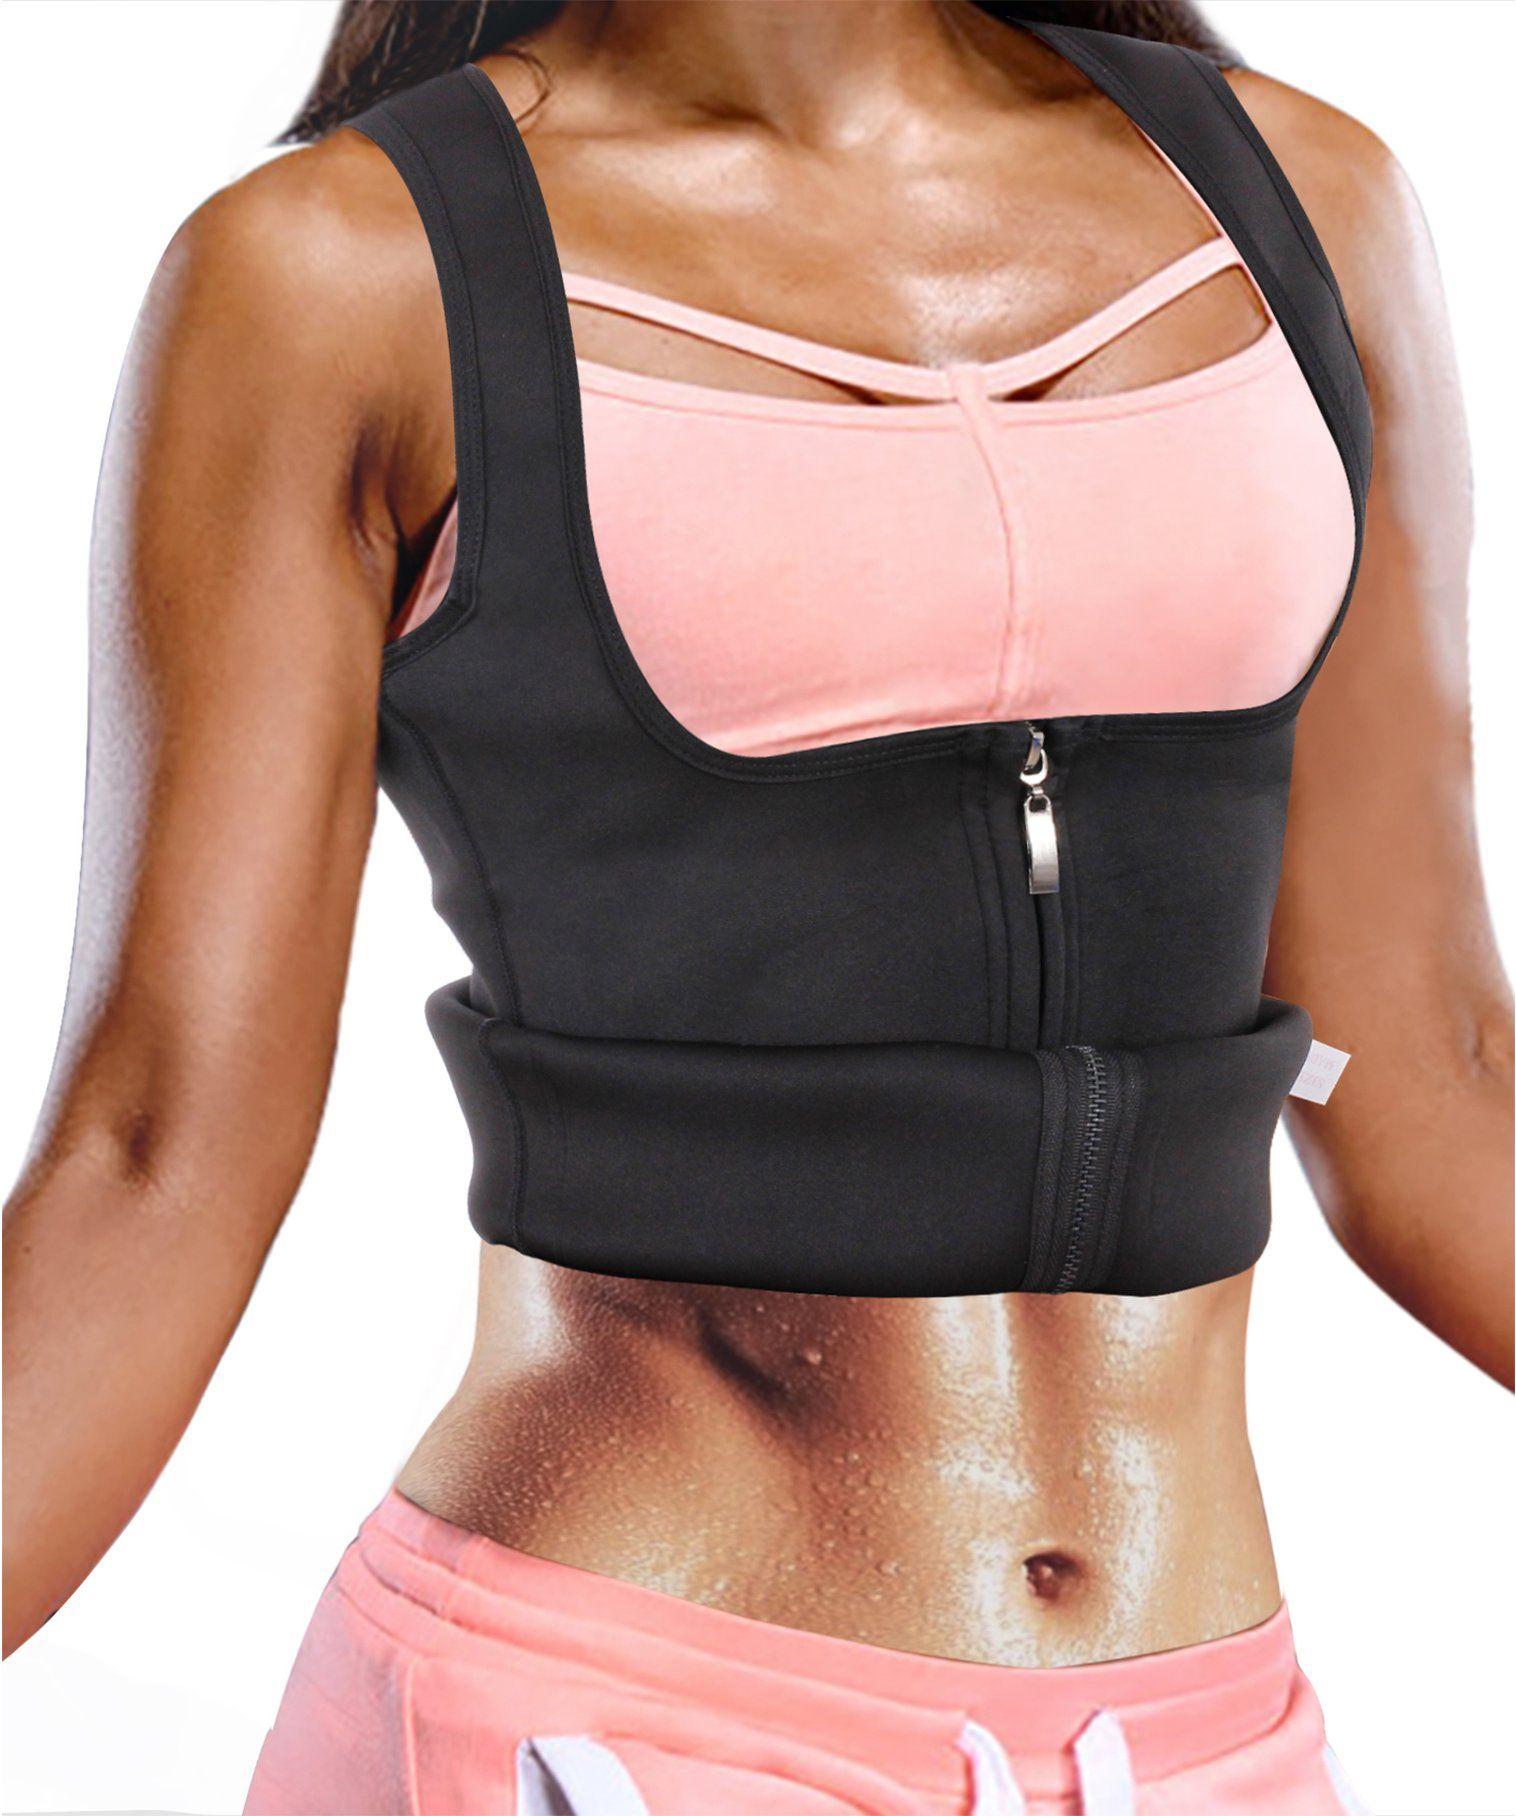 4 Massage Modes Belly Fat Burner Promote Digestion with Mild Heat Slimming Belt Improve Blood Circulation Adjustable Vibration Massage Weight Loss Machine for Women